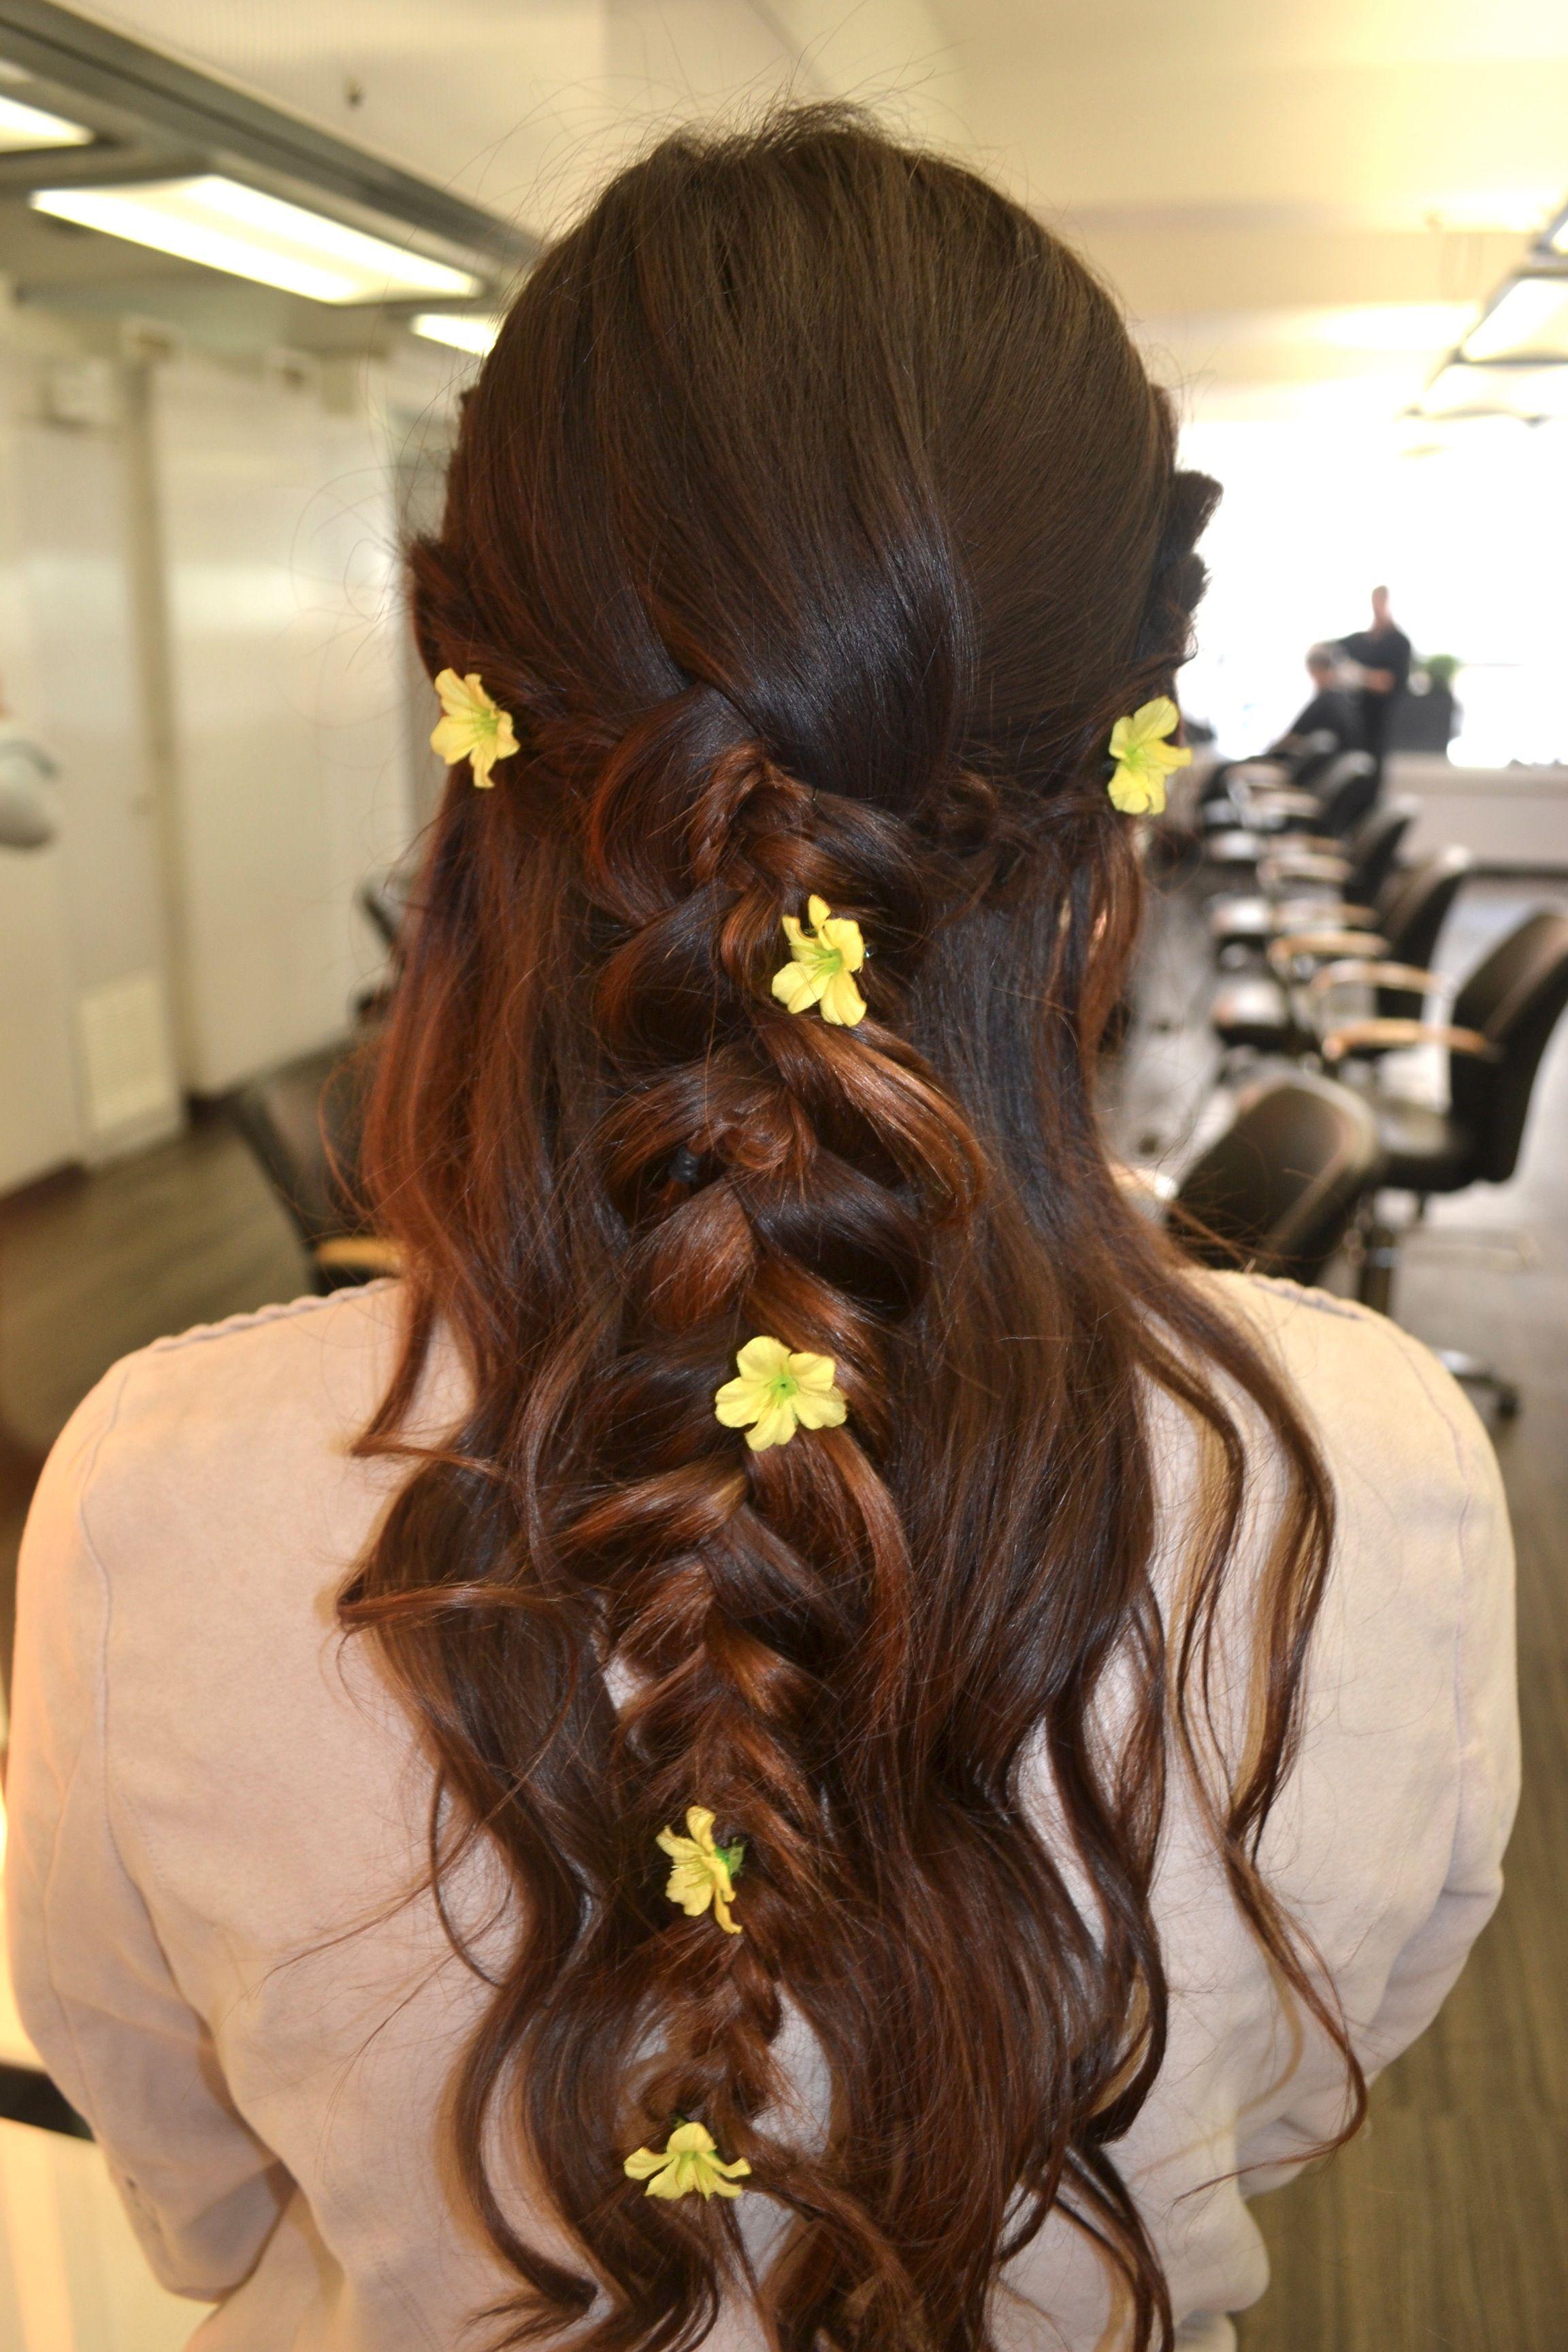 Diy Floral Hairstyles From Boston Salon Owner Style Life Fashion By Kwest1908 Bridesmaid Hair Updo Braid Crown Braid Bohemian Hair Crown